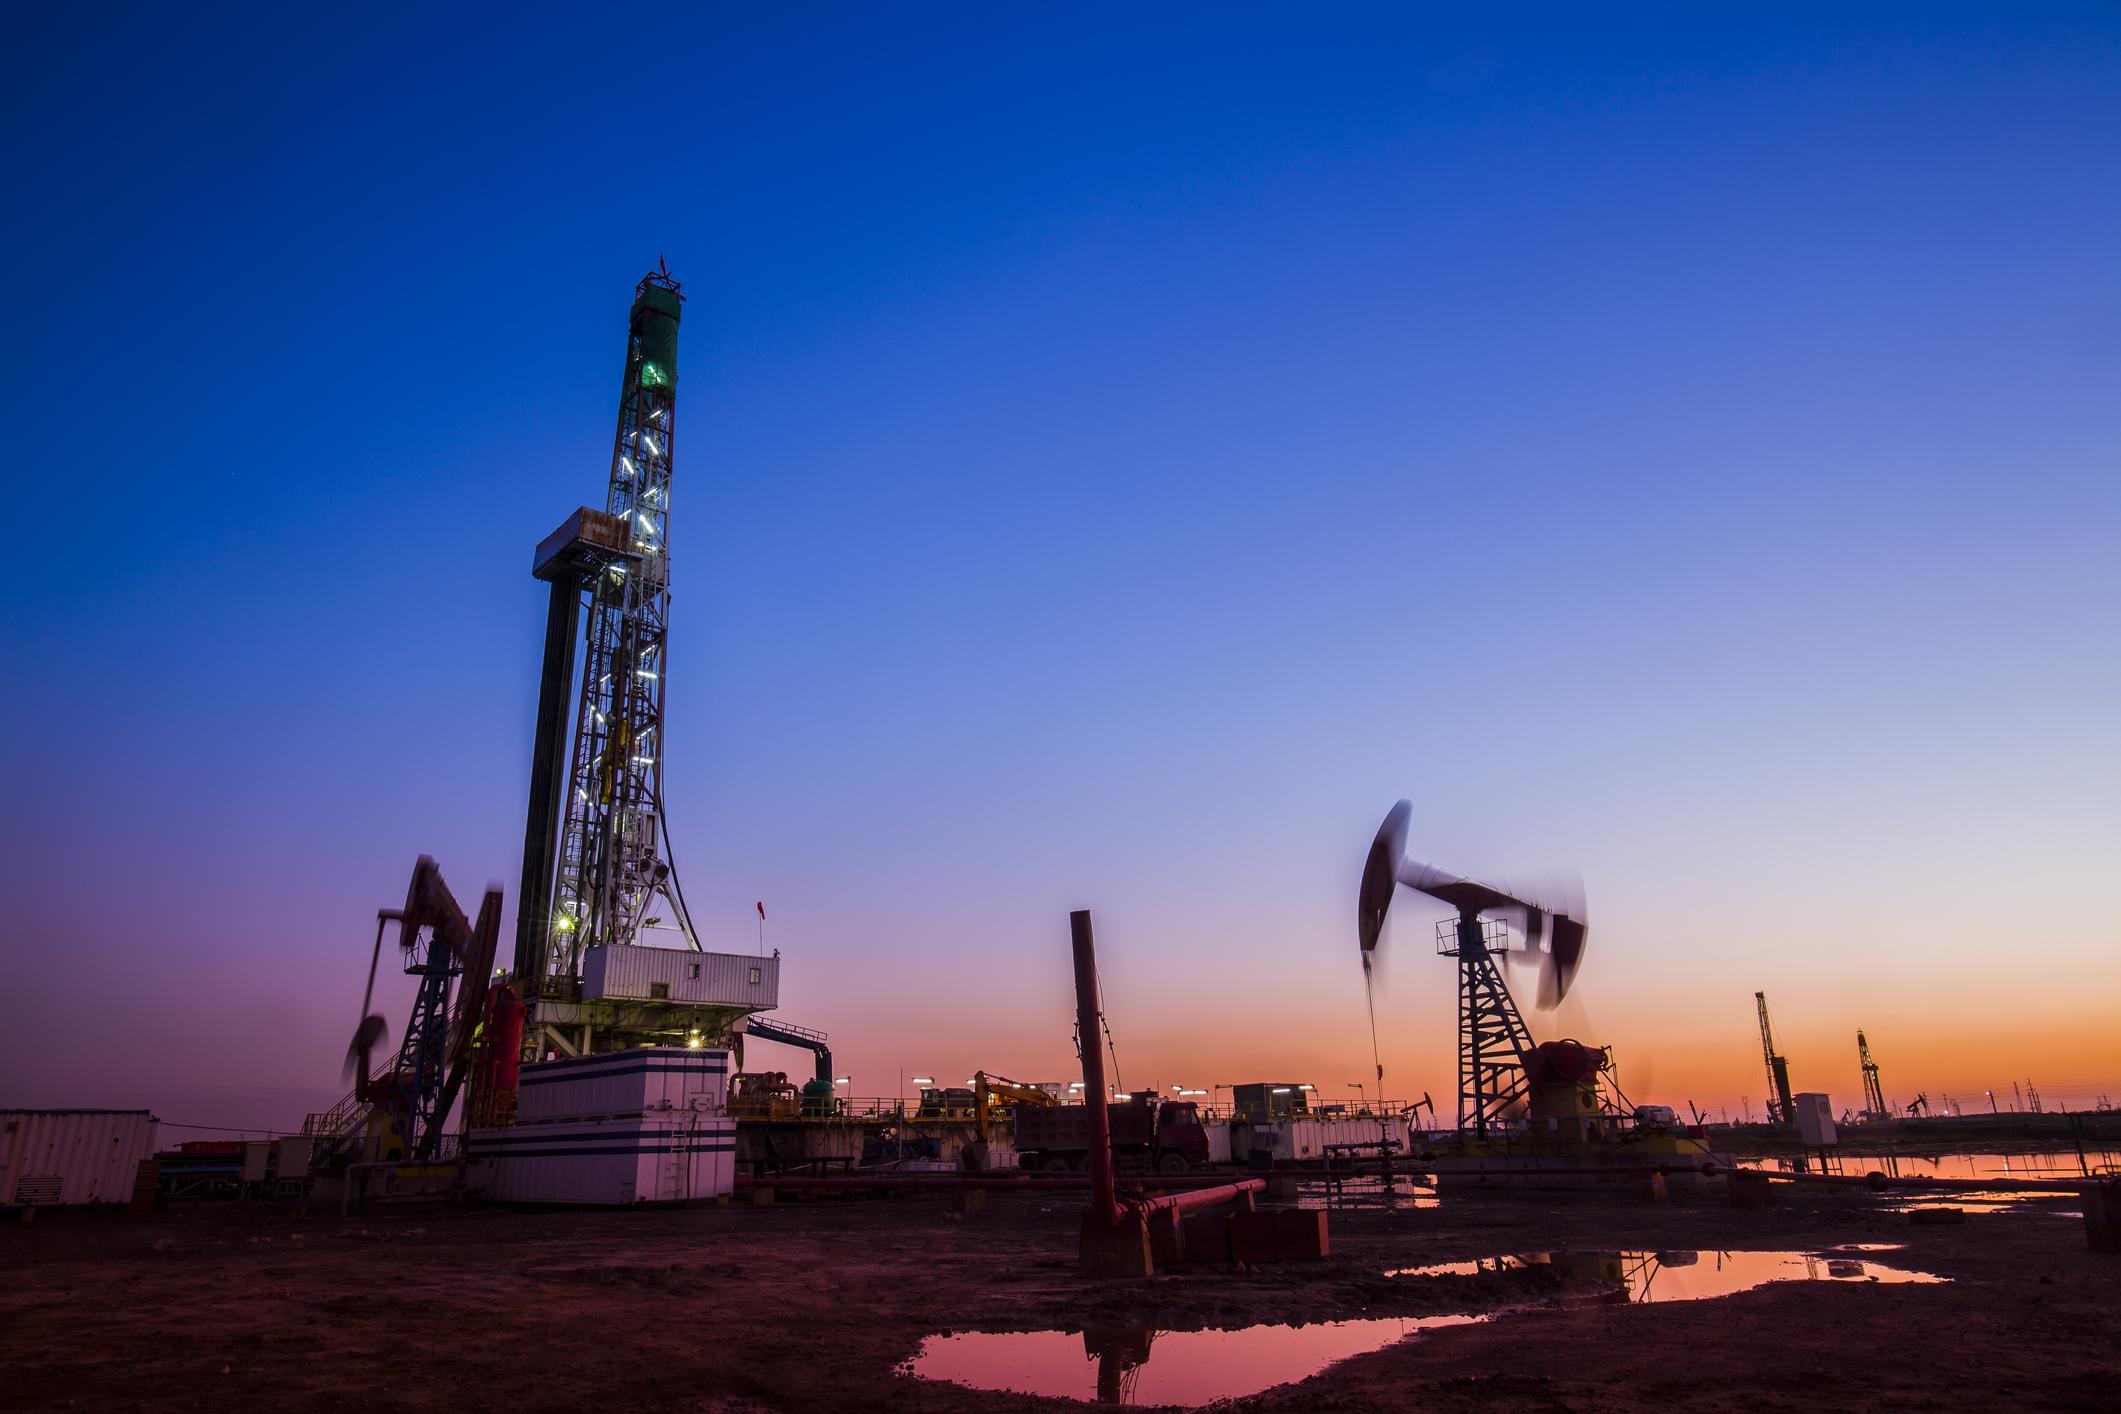 Drilling rig and pumpjack at dusk